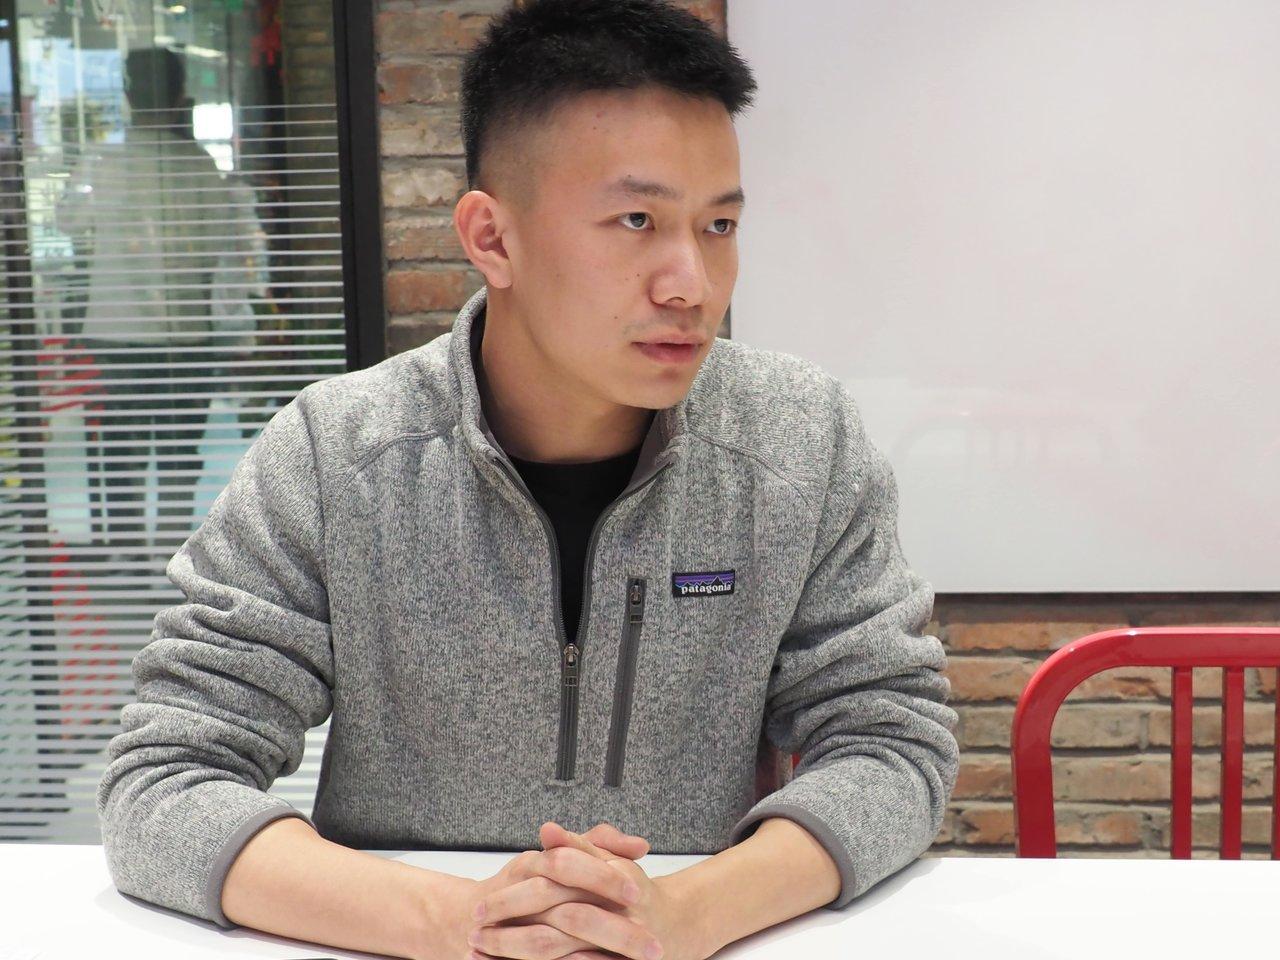 >ARPA社の創業者の一人で、CGO(Chief Growth Officer)であるYemu Xu(徐野木)氏